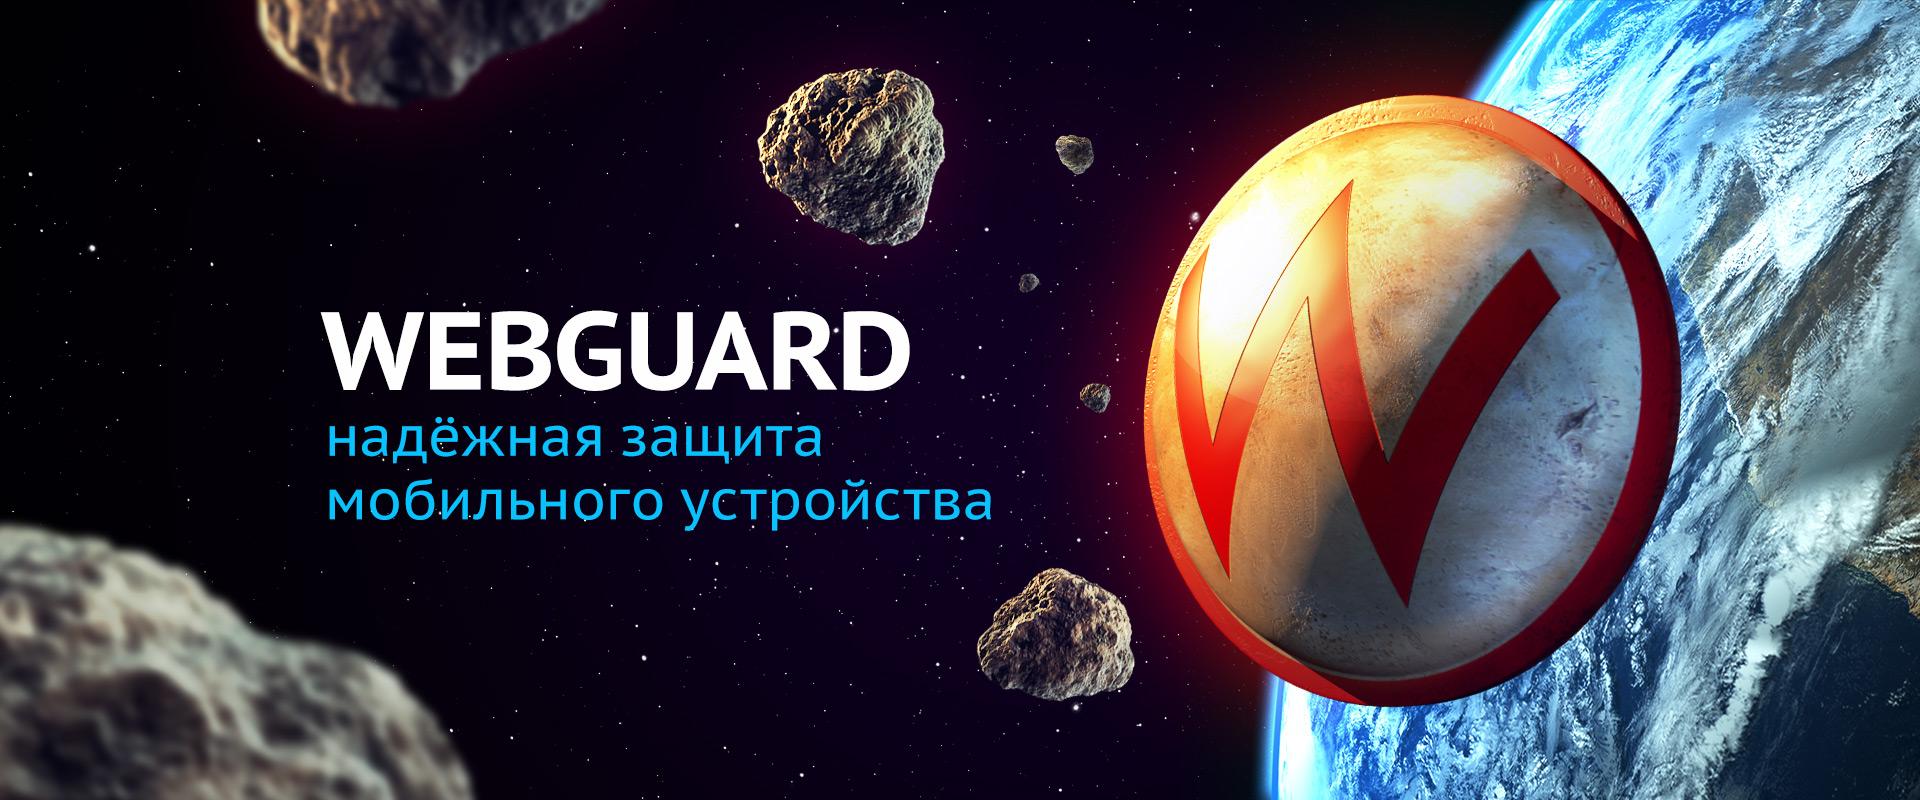 slide_app_webguard_ru